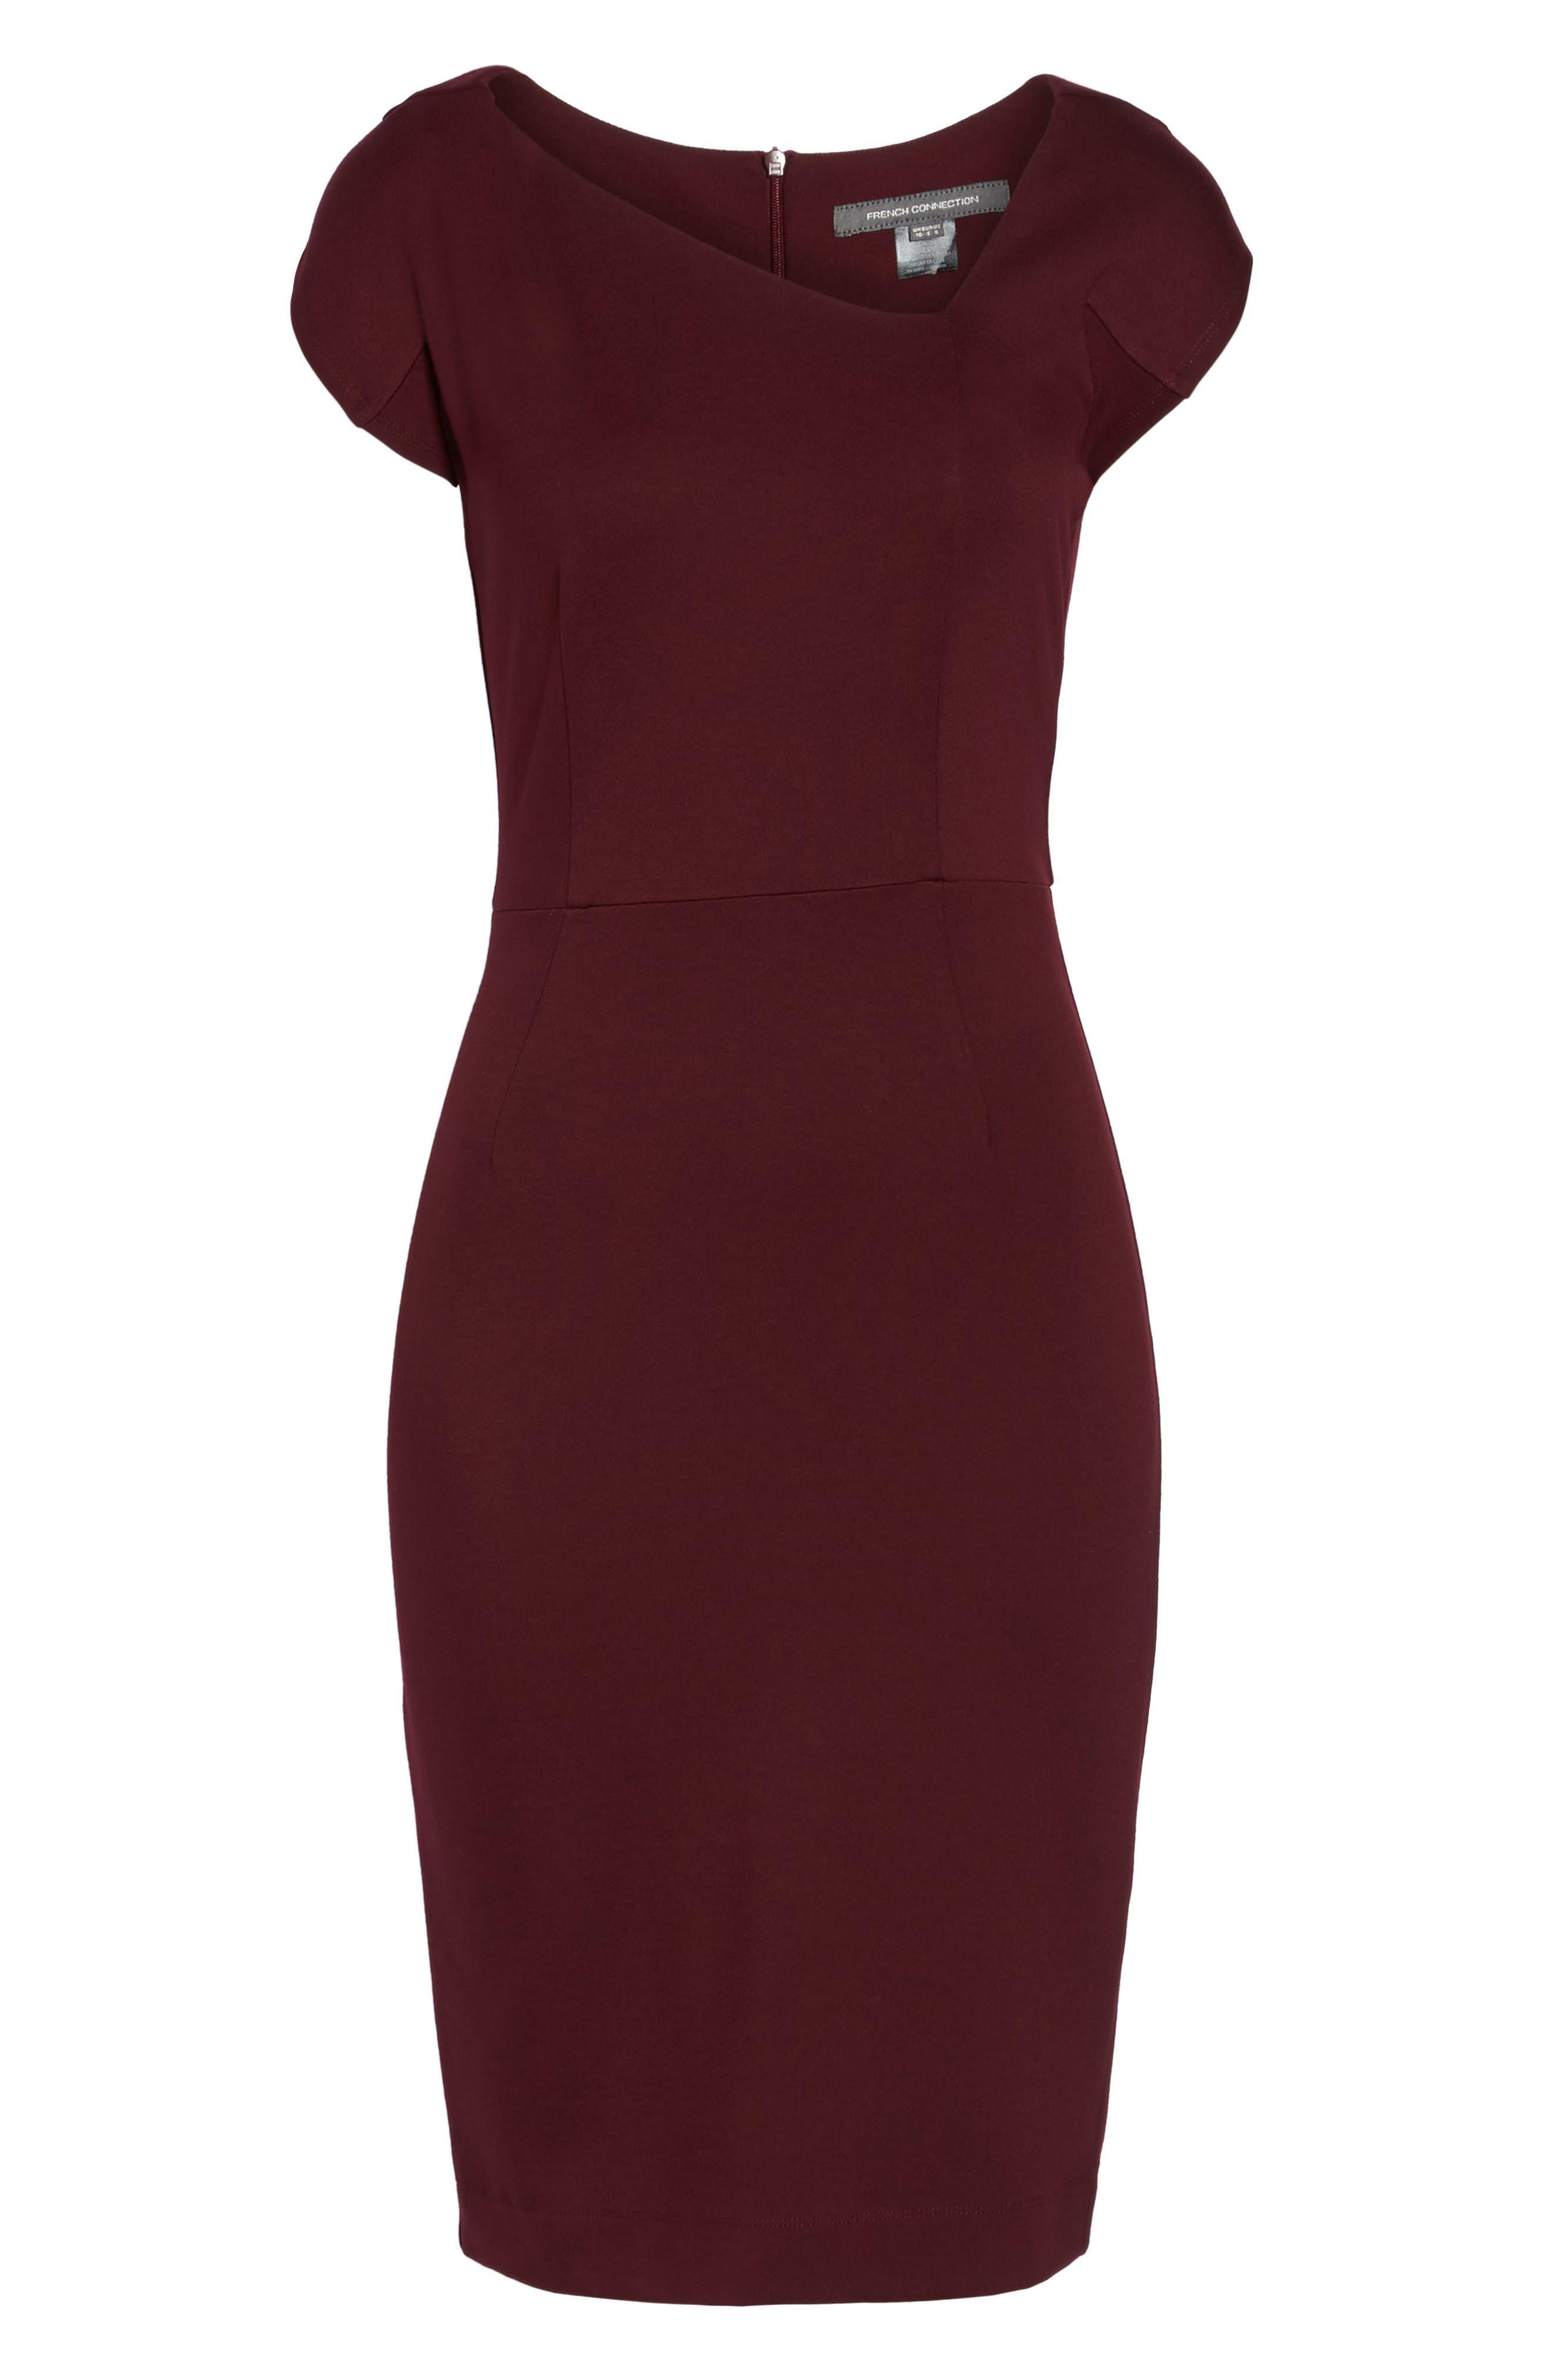 FRENCH CONNECTION,                             Lula Sheath Dress,                             Alternate thumbnail 6, color,                             935